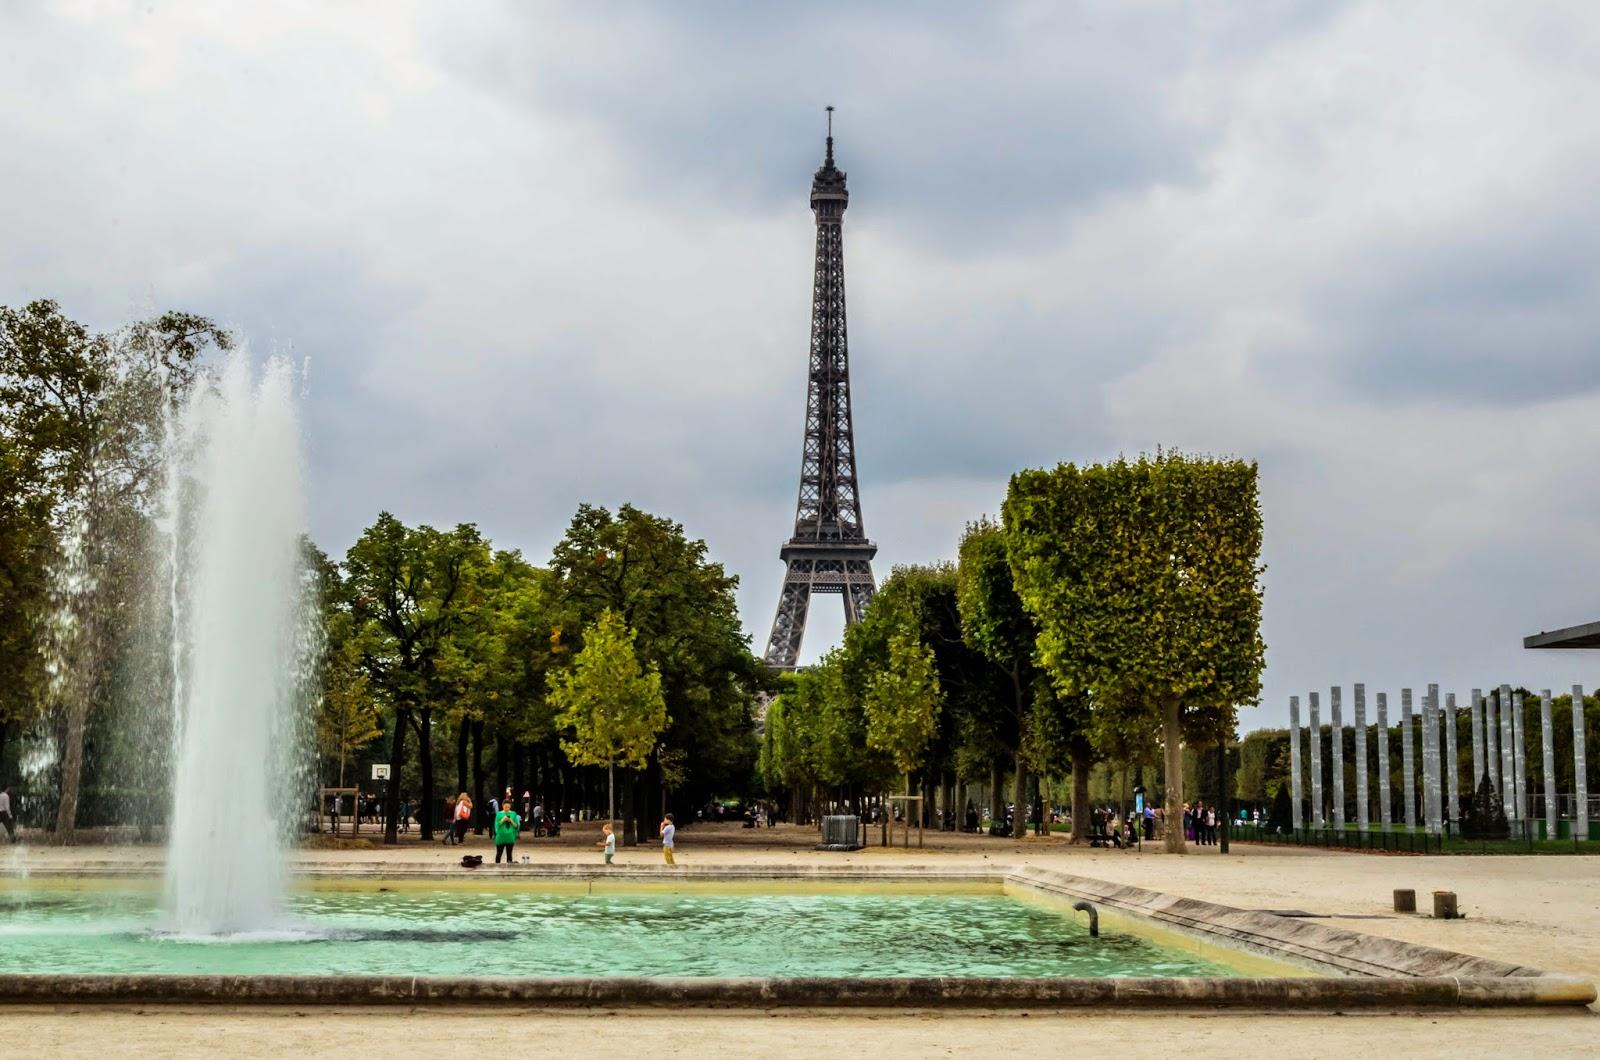 Fotografia do chafariz da Torre Eiffel